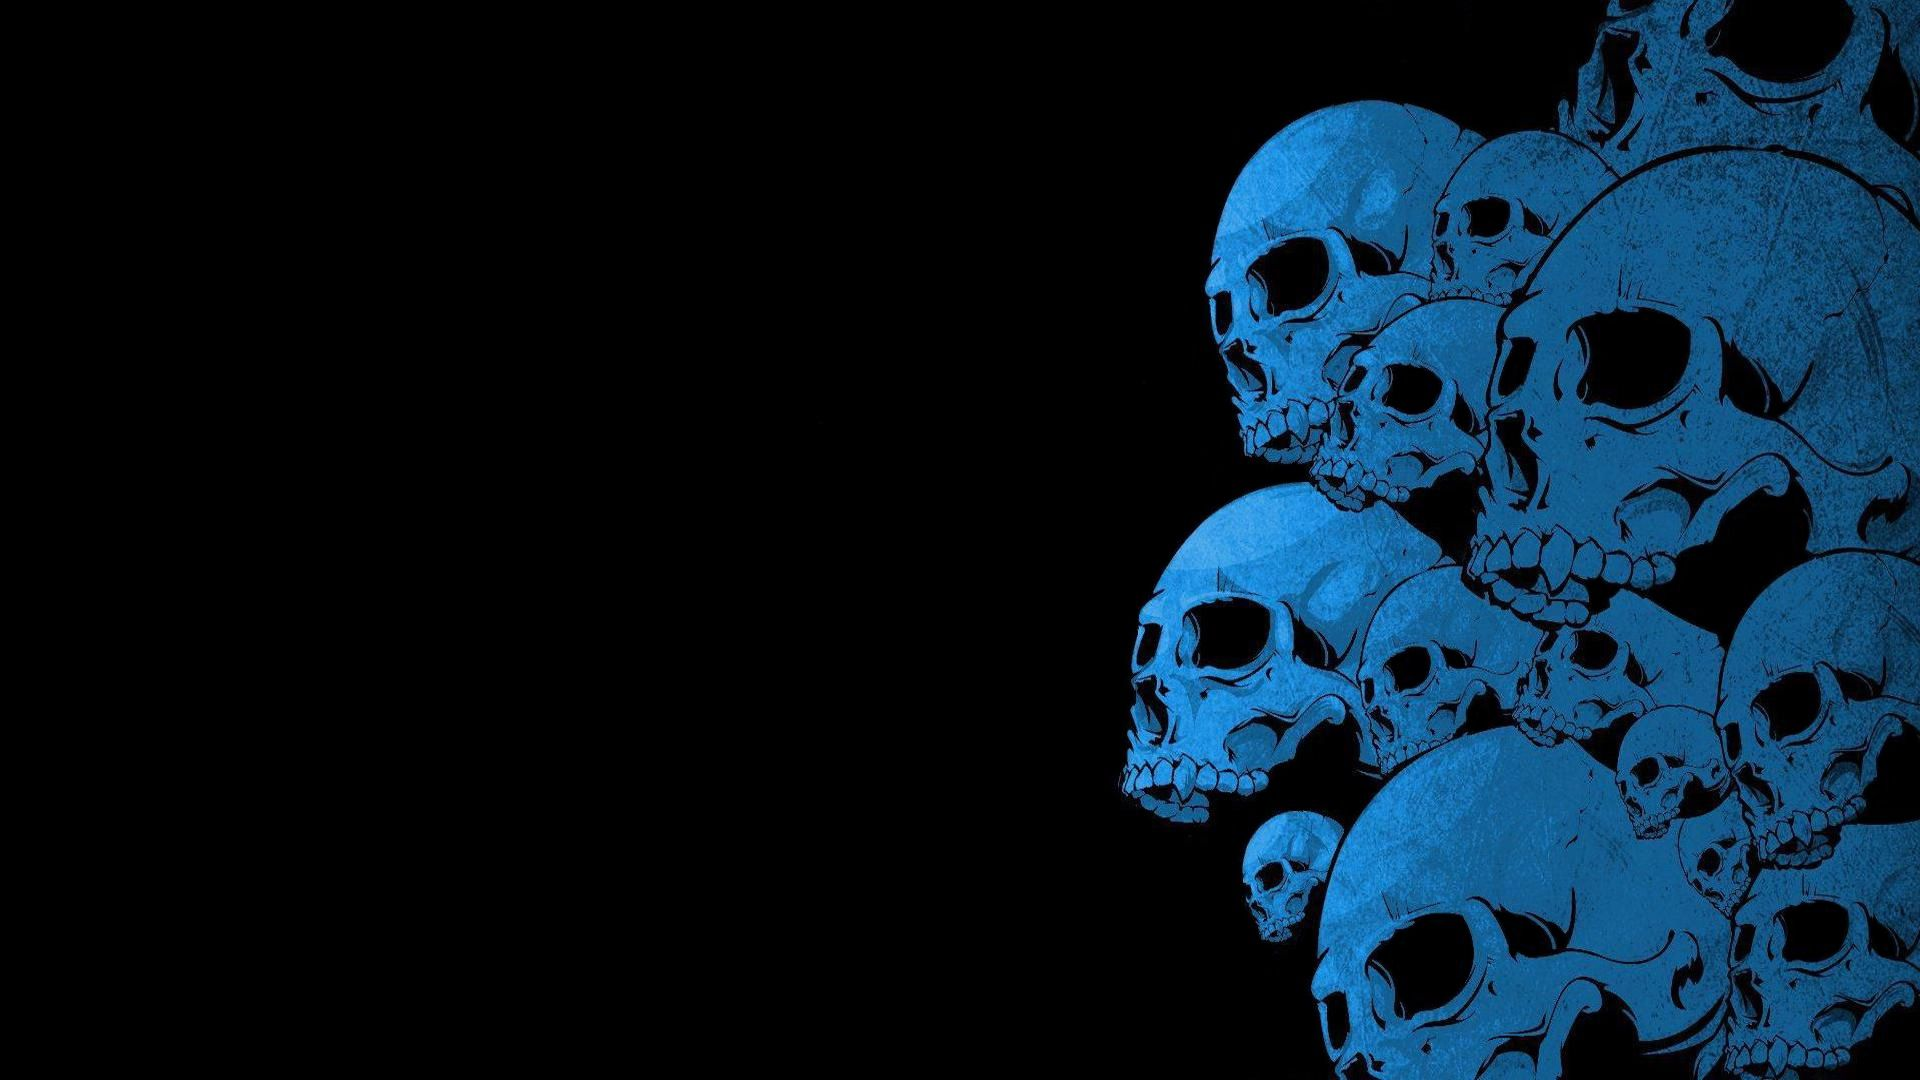 Skull Wallpaper Hd The Hippest Galleries